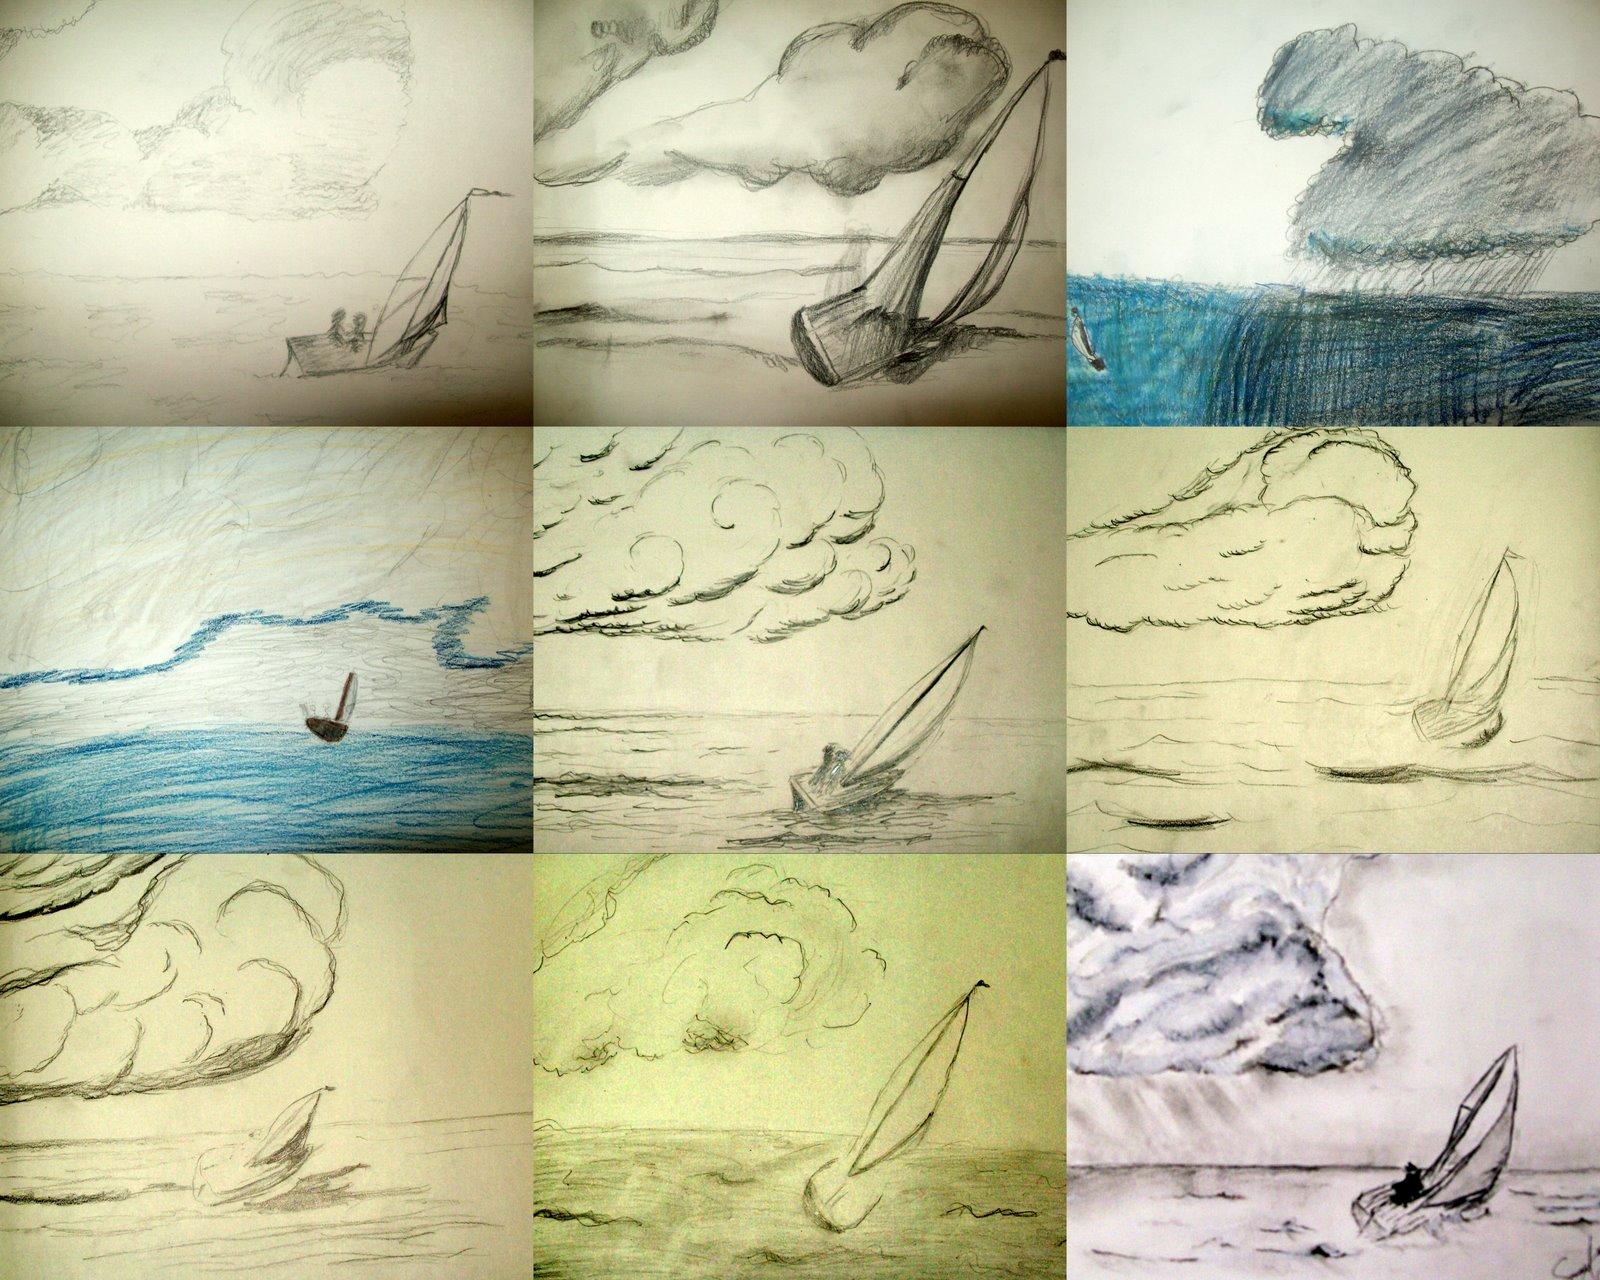 [Butterfly,+Clouds,+Coop+art.jpg]